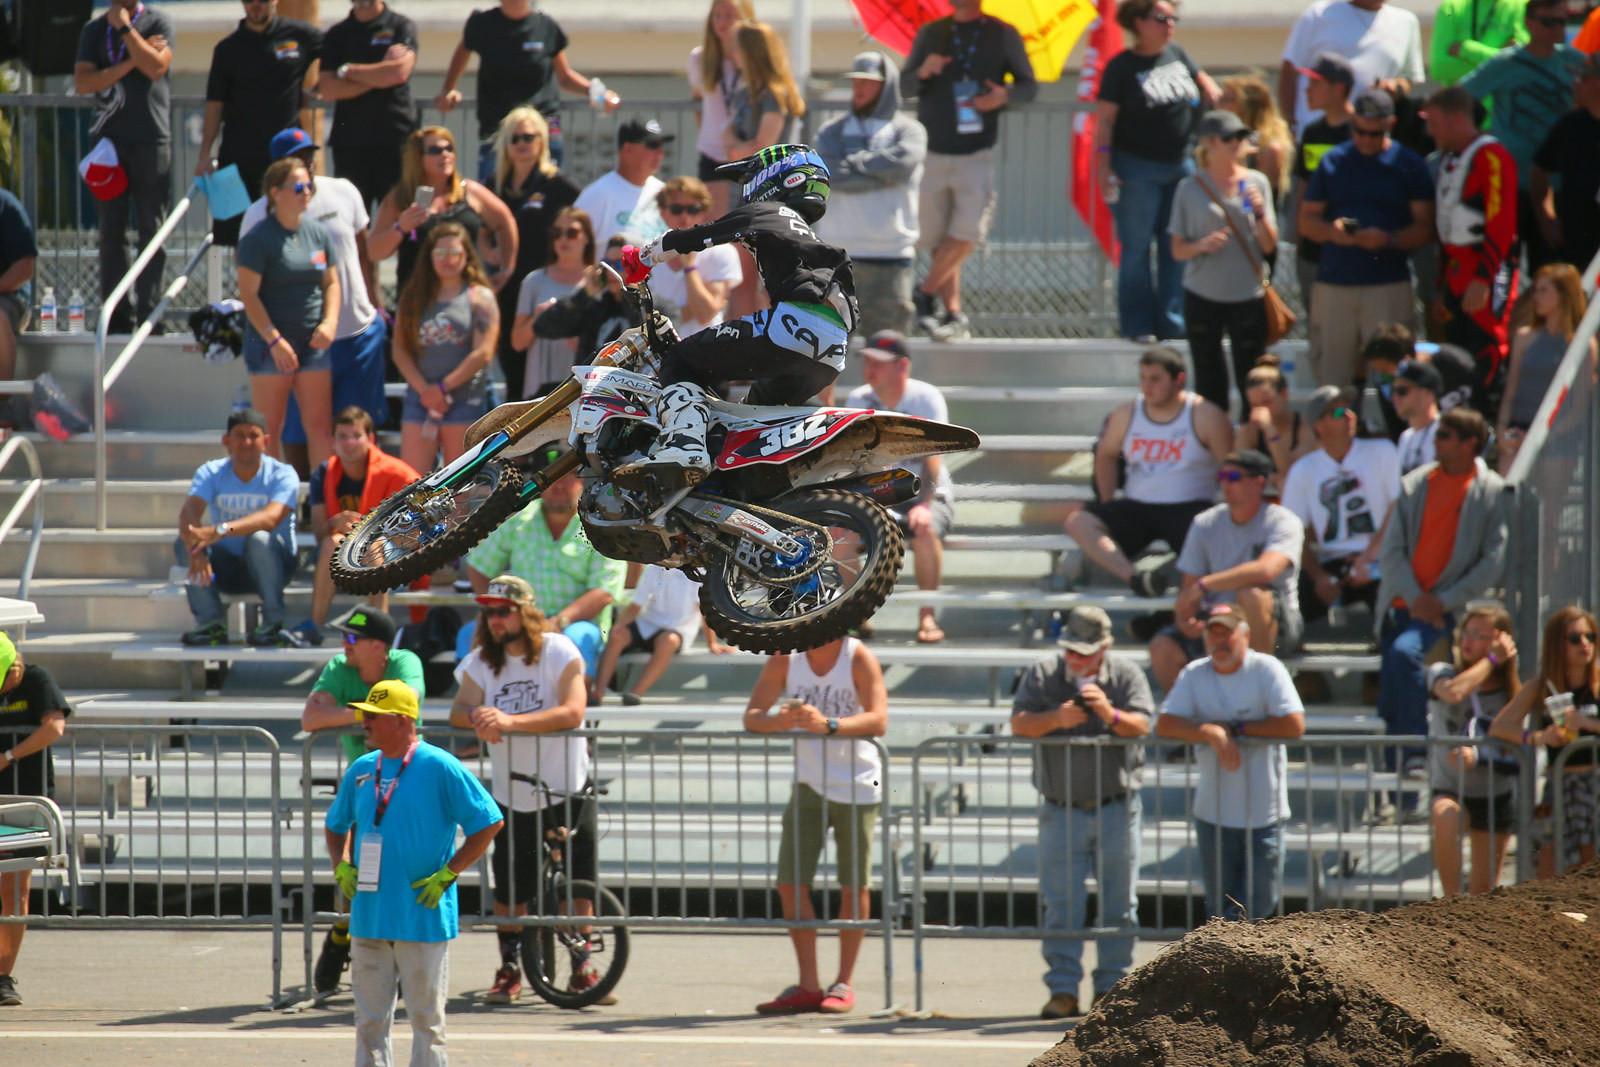 Tanner Stack - 2016 Ricky Carmichael Amateur Supercross - Motocross Pictures - Vital MX